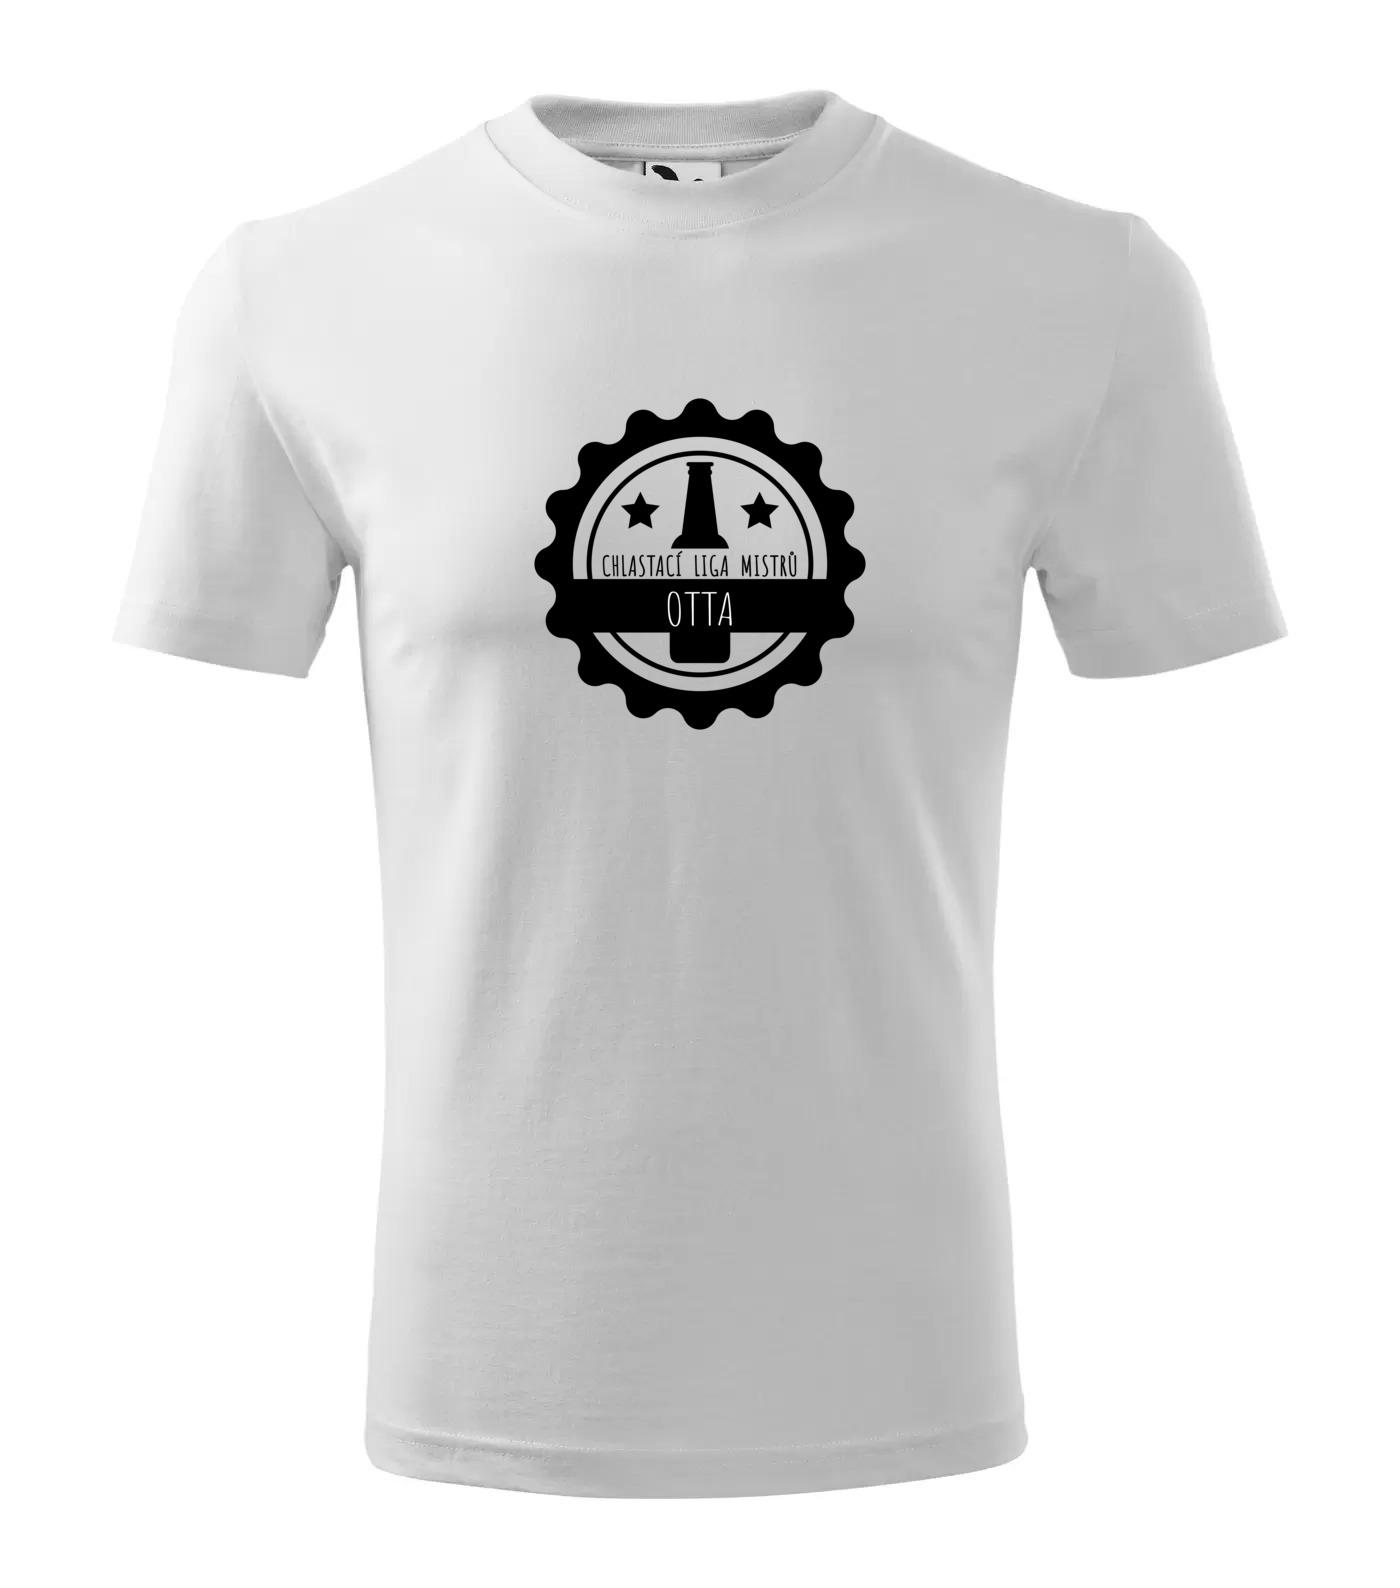 Tričko Chlastací liga mužů Otta